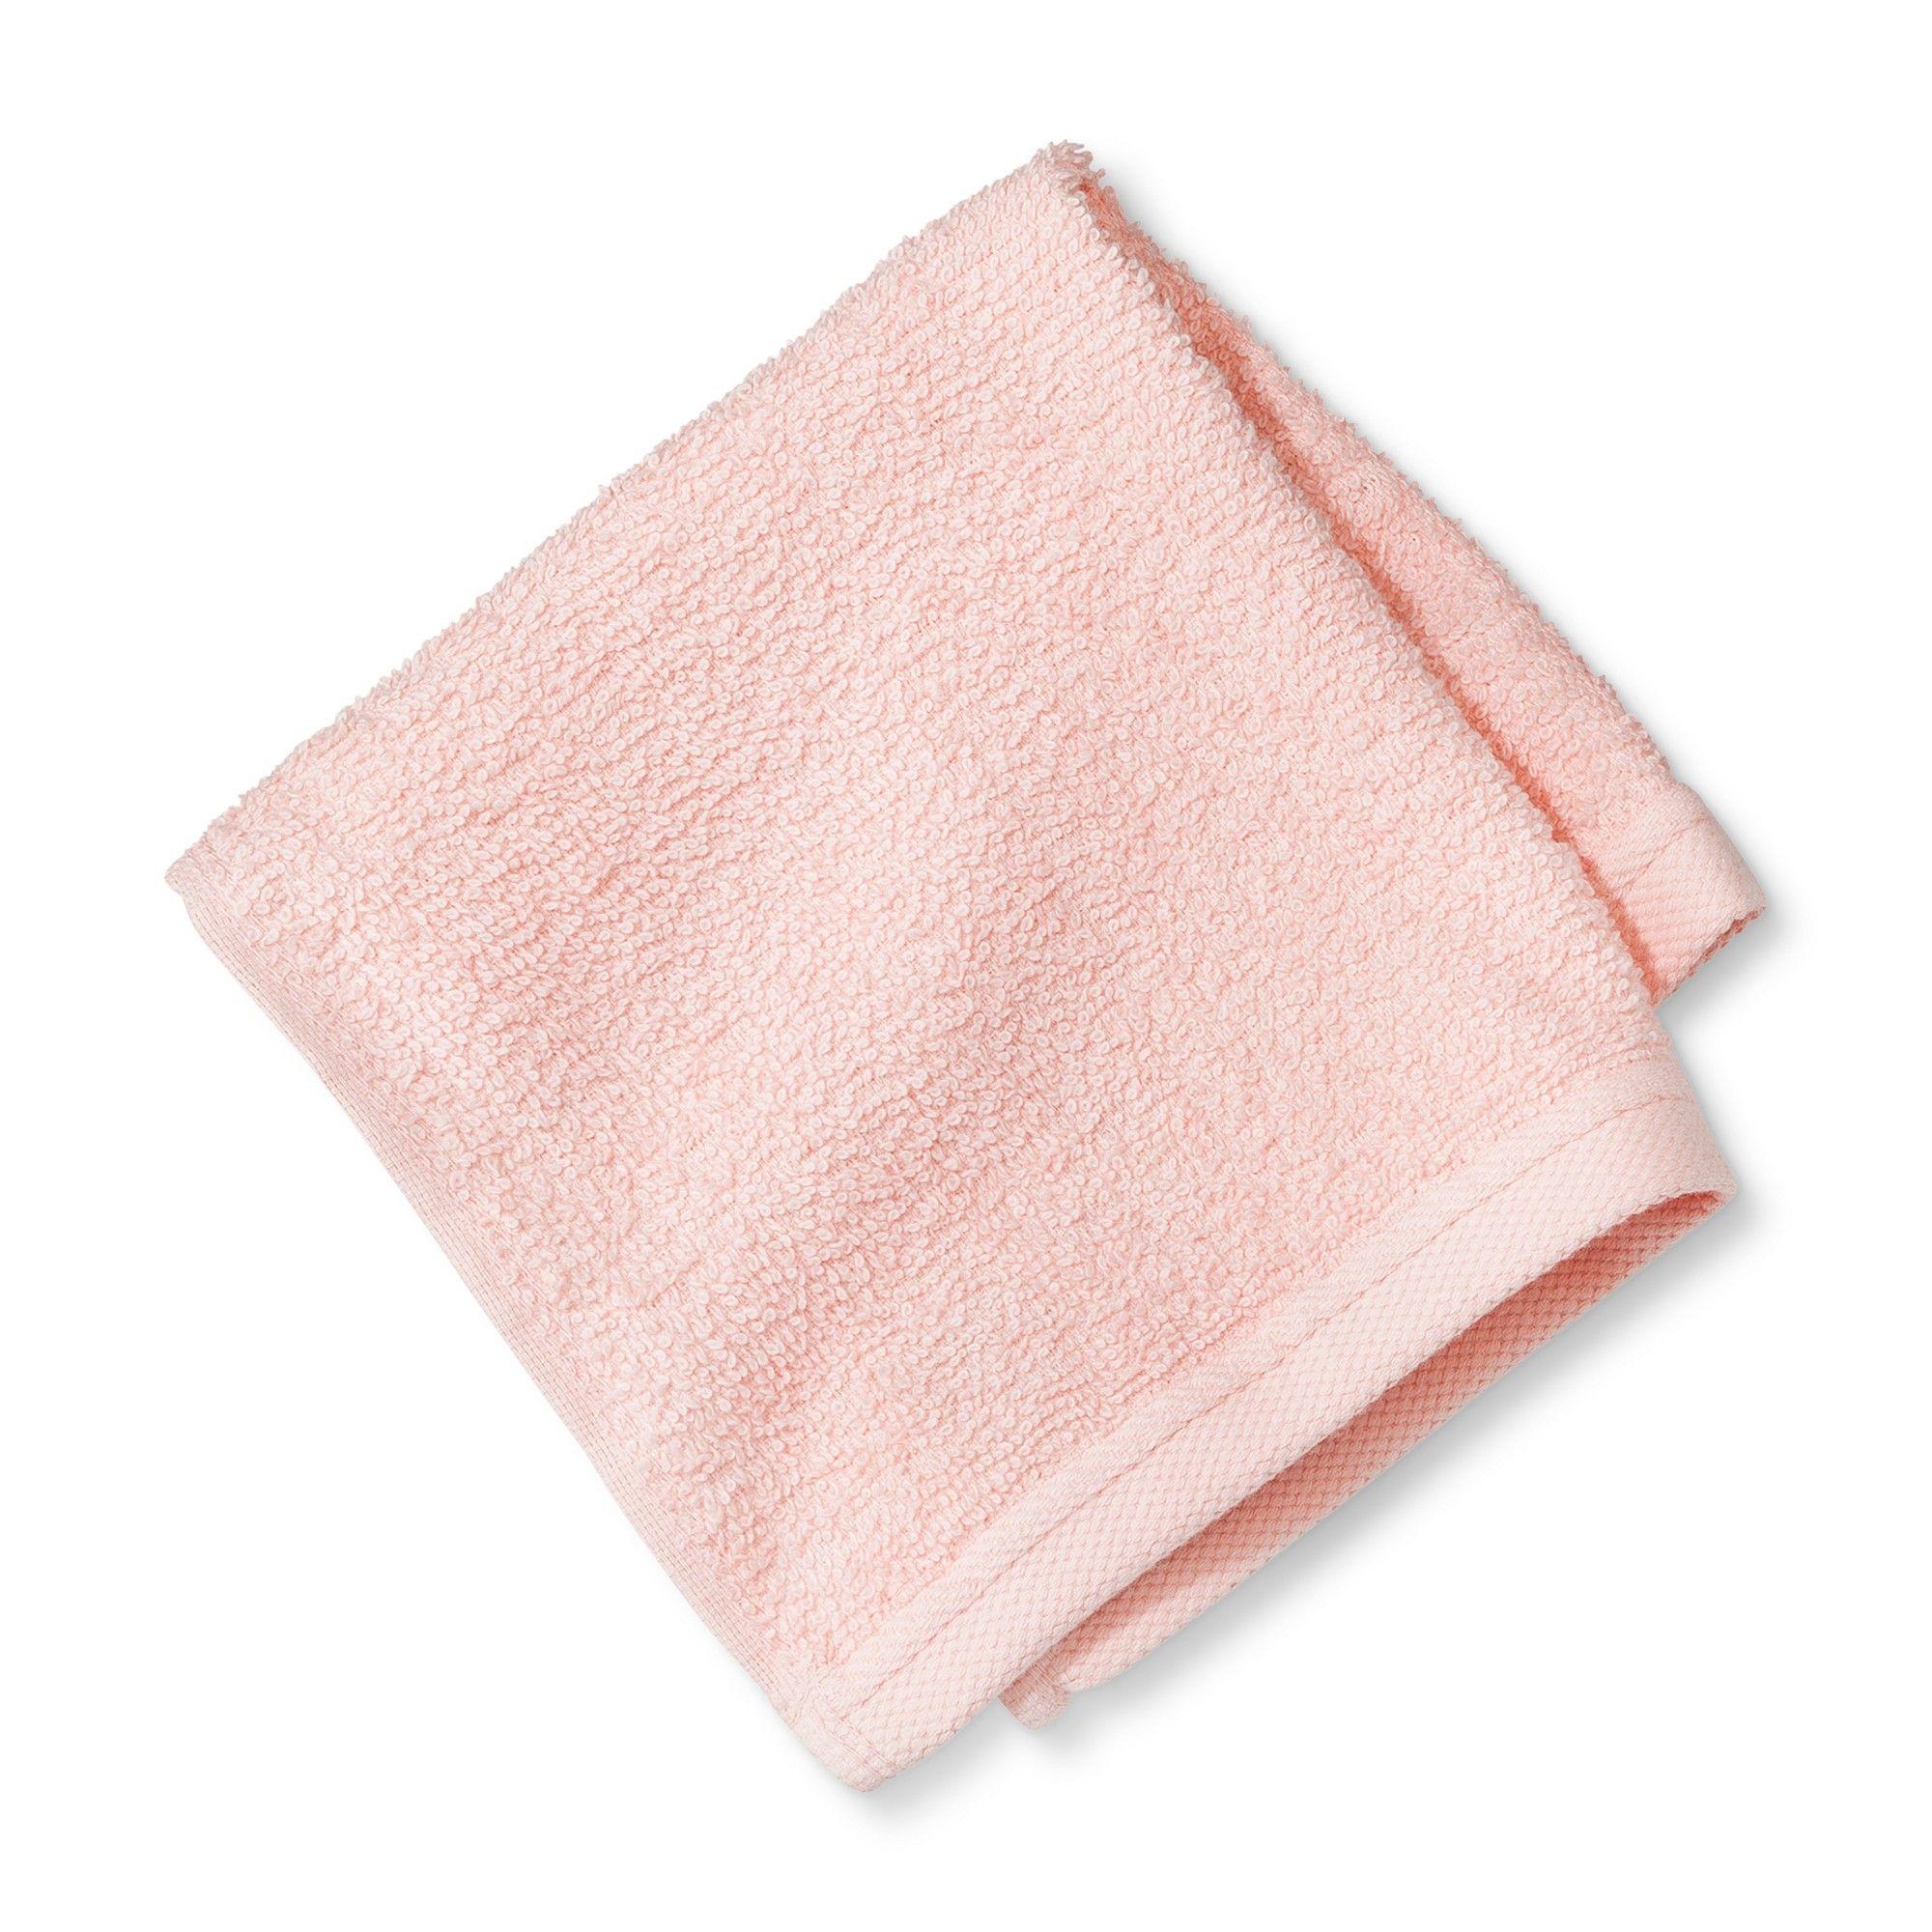 Bath Towels And Washcloths Loring Pink - Room Essentials